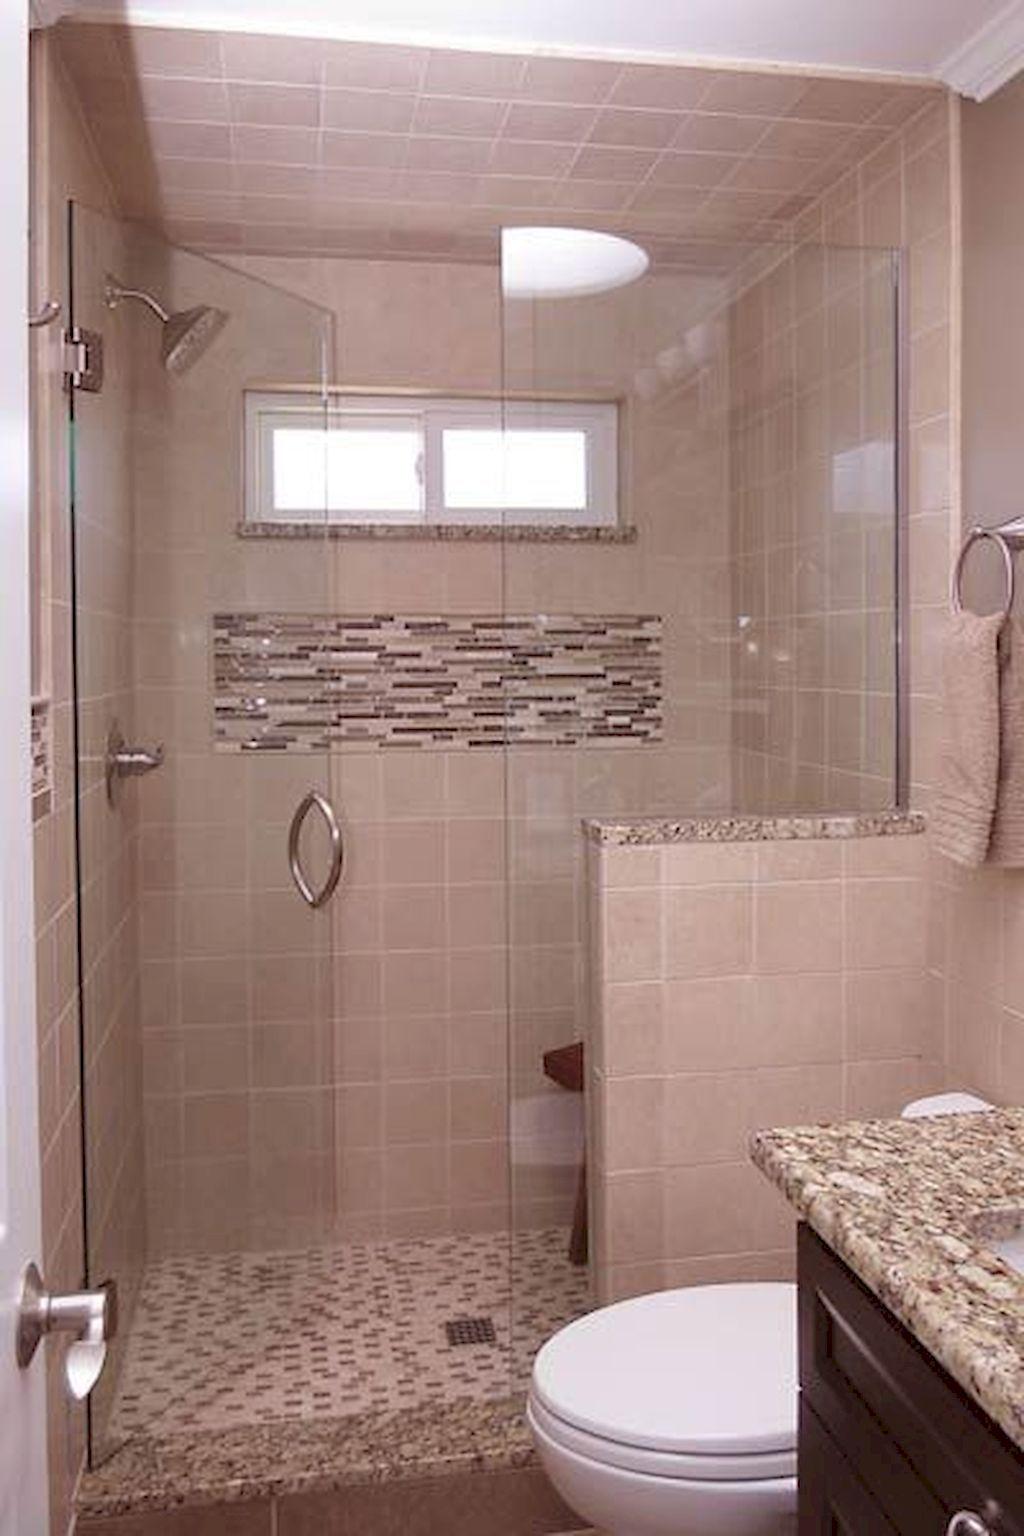 100 small bathroom remodel design ideas on a budget on bathroom renovation ideas on a budget id=71877